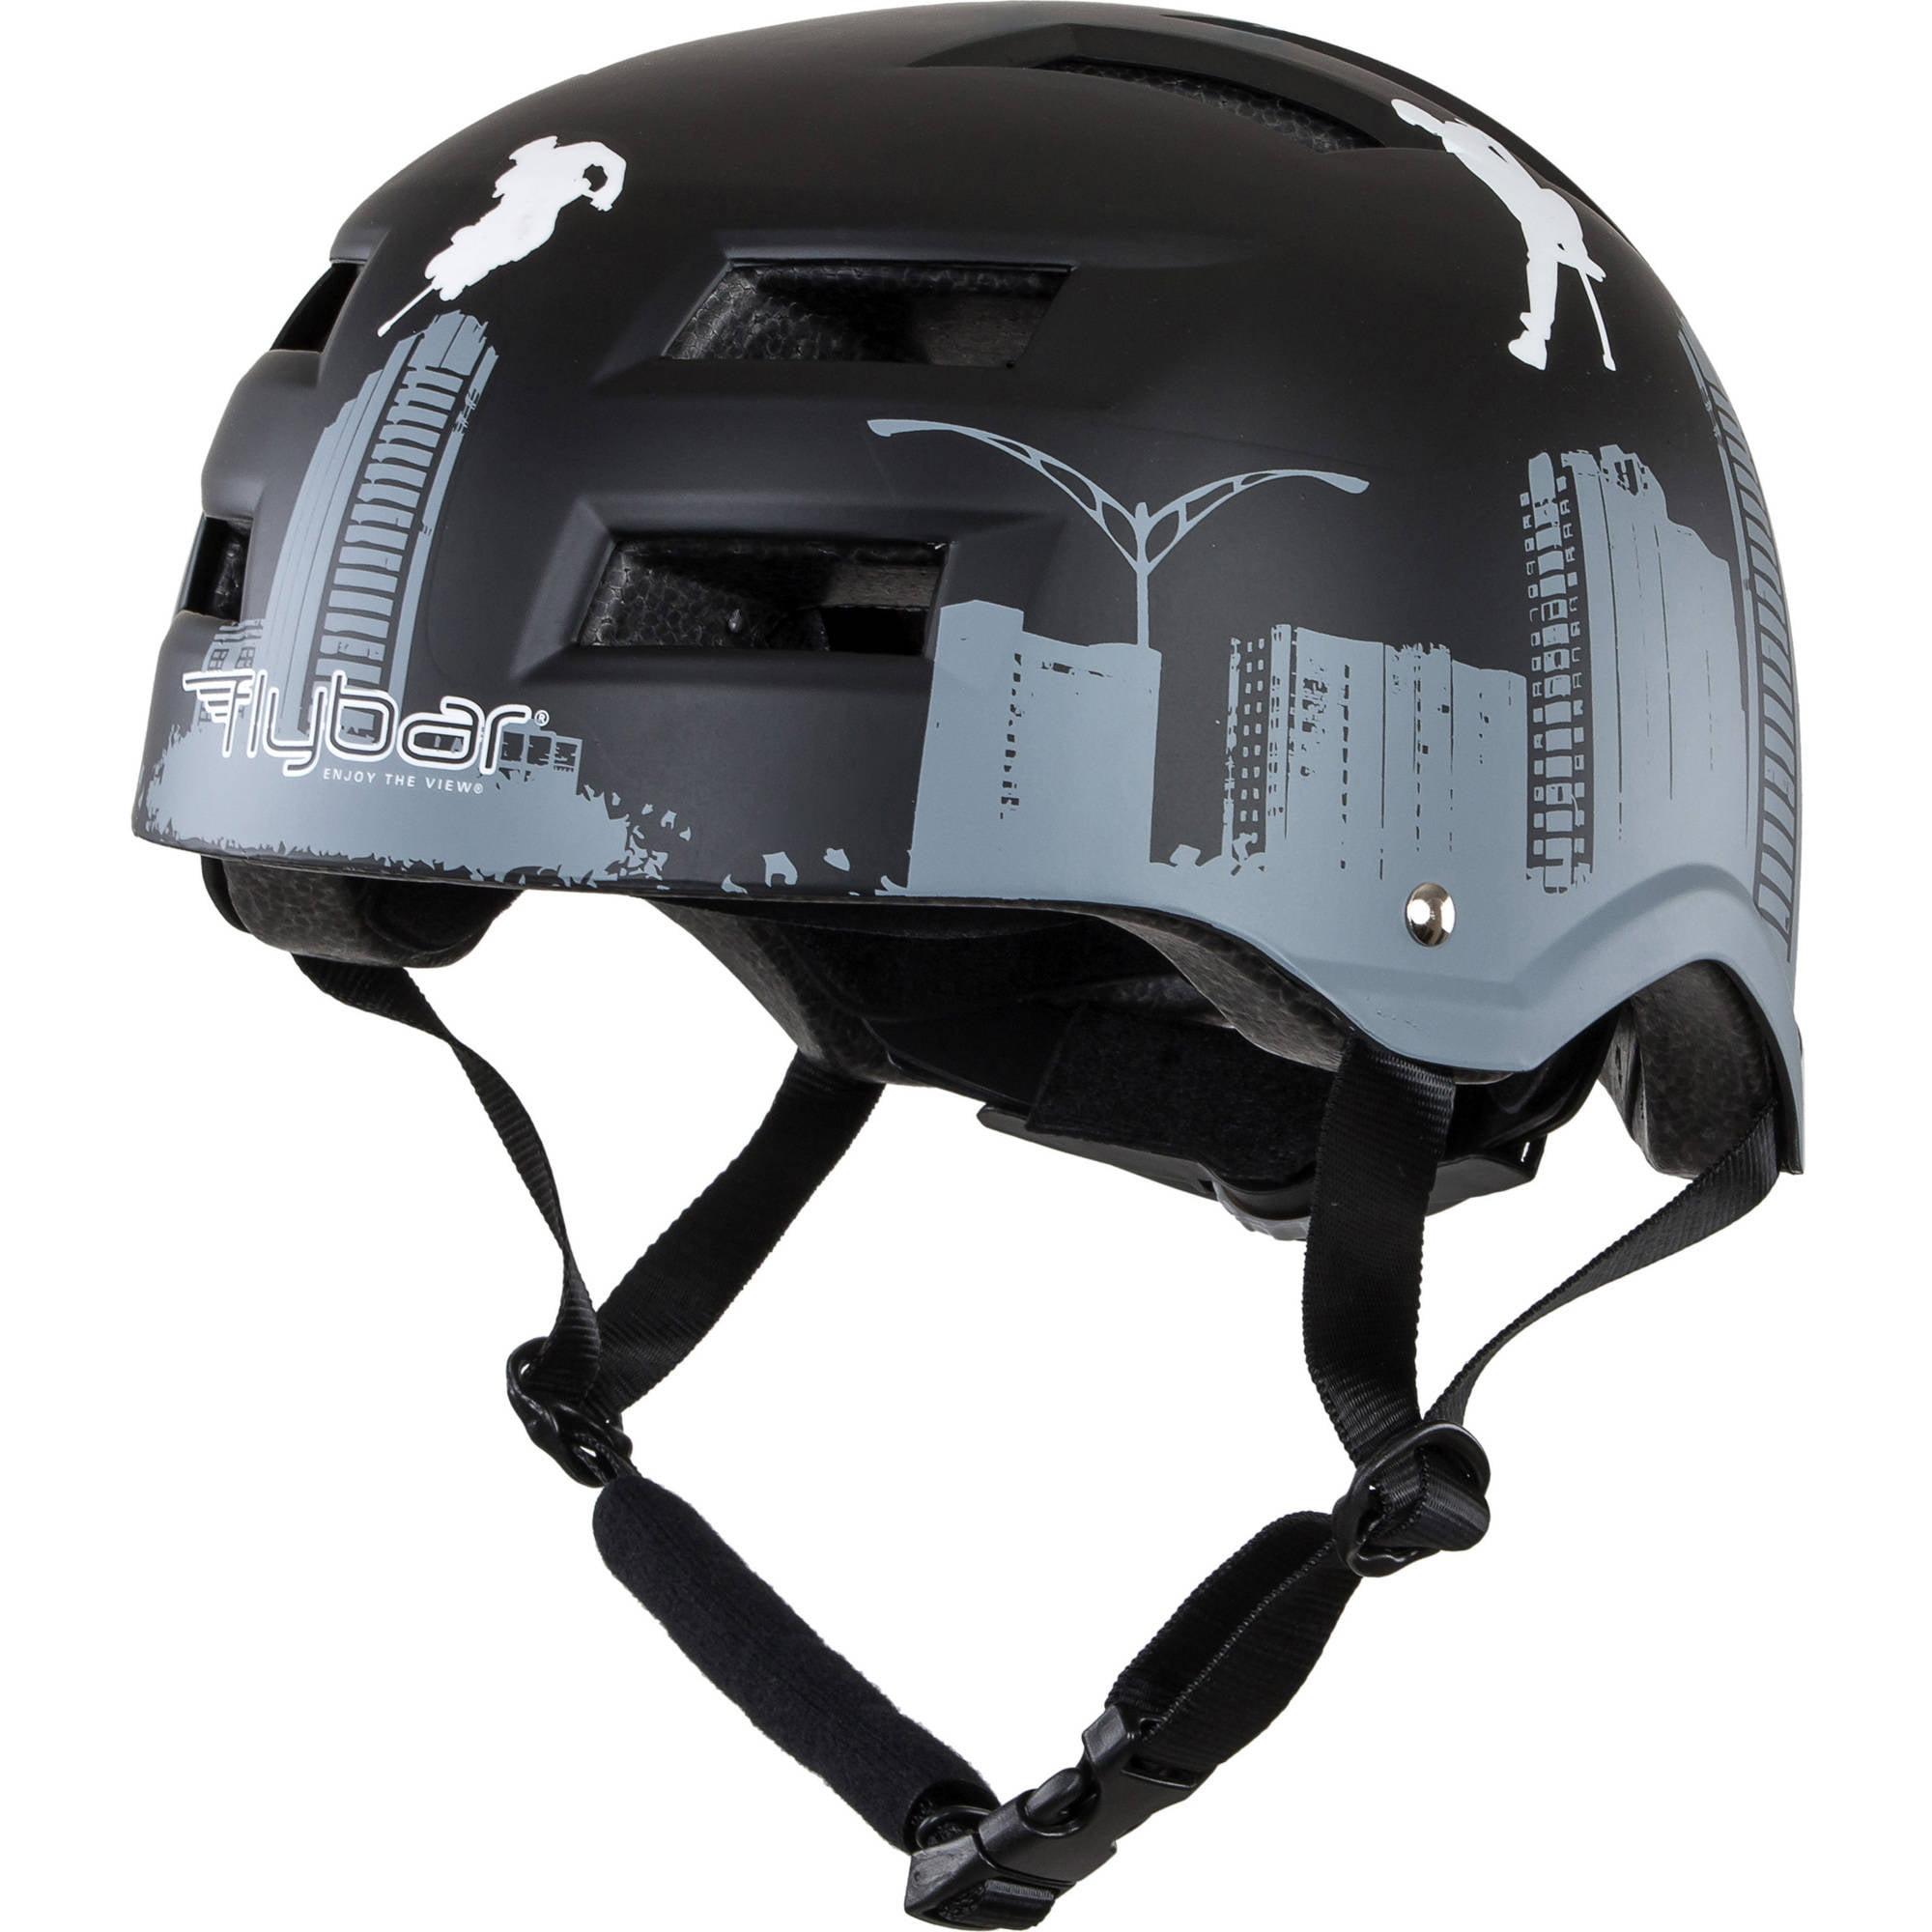 Flybar Multi Sport Helmet, Flyscraper, S M by Flybar